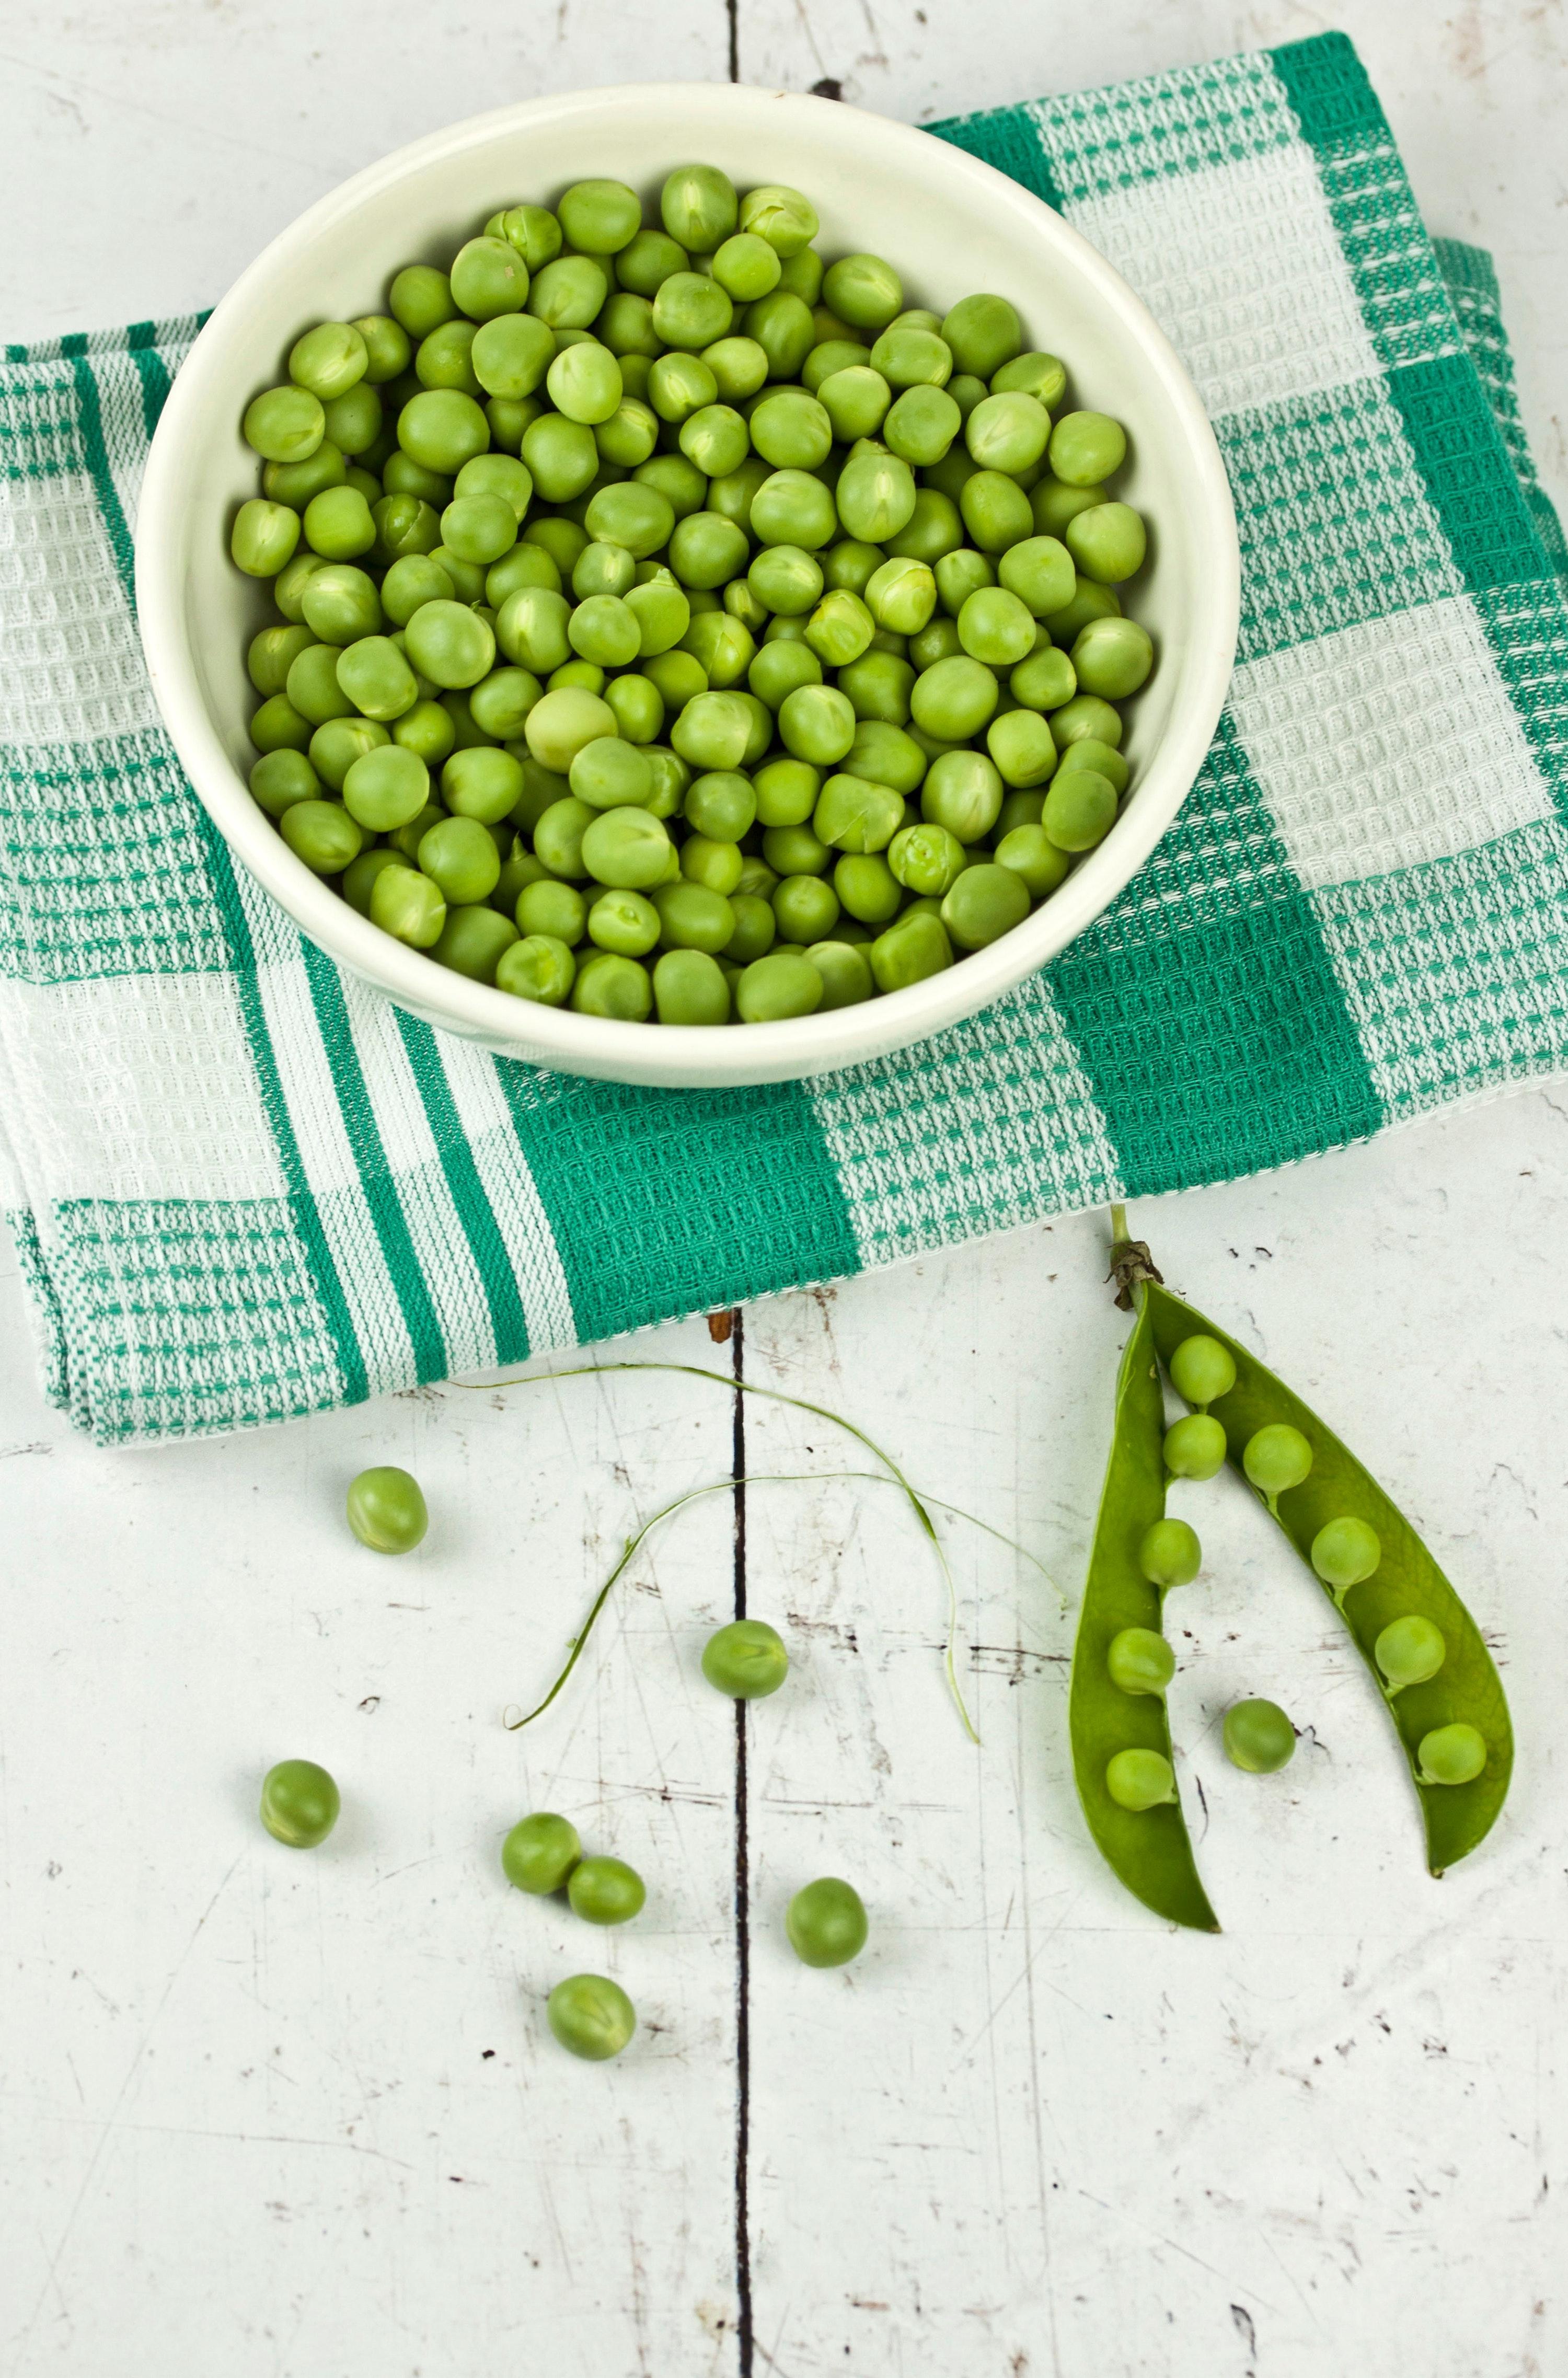 beans-bowl-food-768089